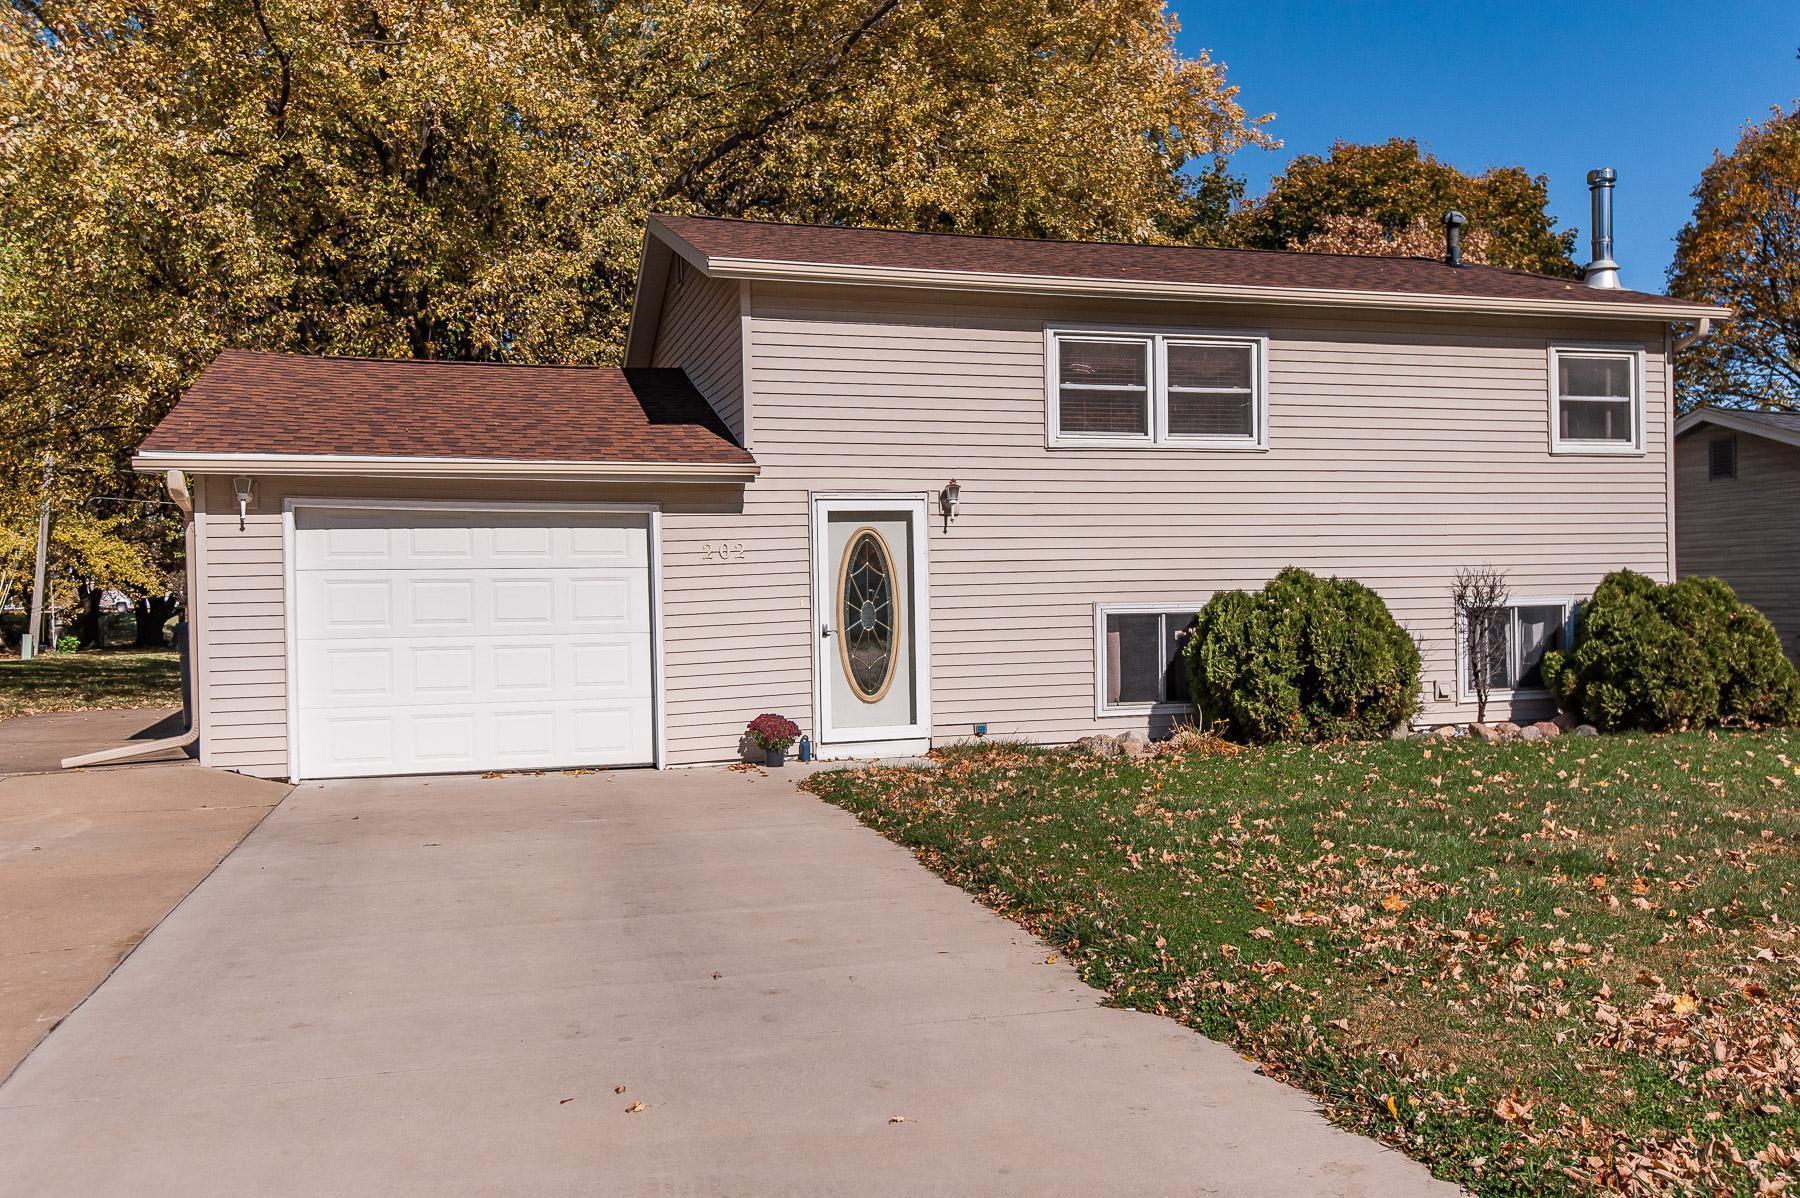 202 3rd Street NE Property Photo - Dodge Center, MN real estate listing